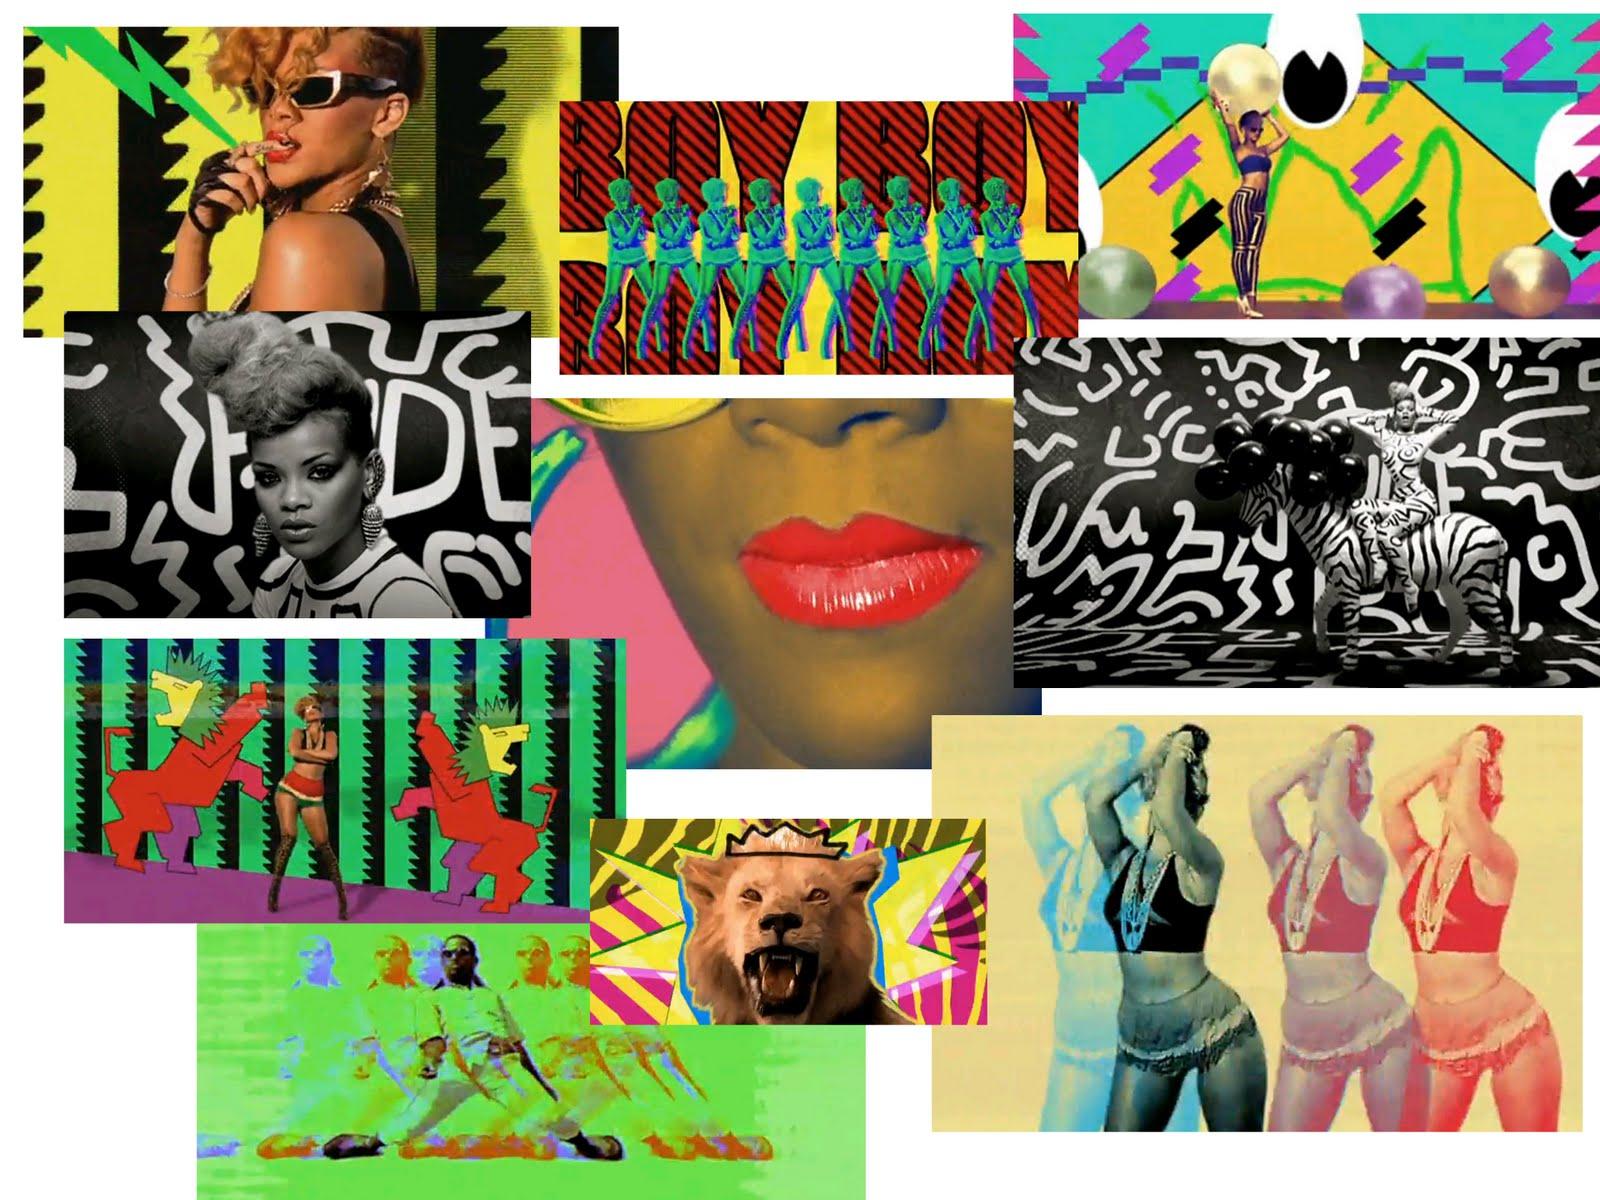 http://3.bp.blogspot.com/-az4AcDKOTlQ/Te1H5Og3KUI/AAAAAAAAAgc/YS2ighmodto/s1600/kitschissime_colorful_rihanna_maya%2Bpop.jpg